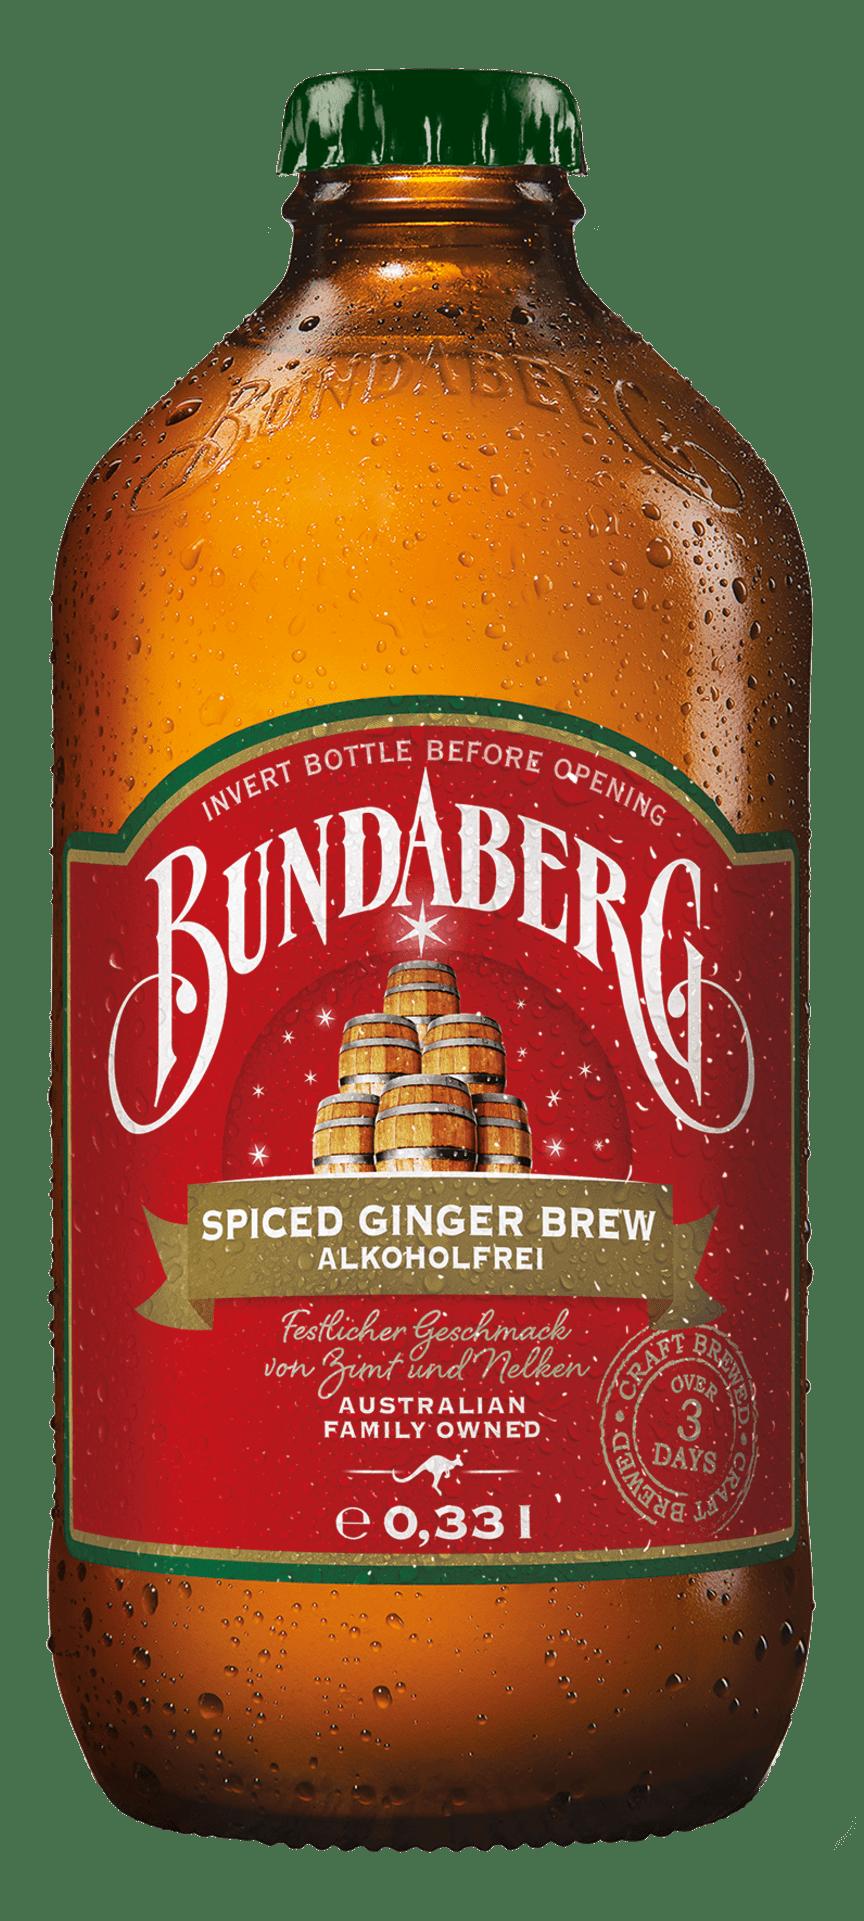 Bundaberg_Flasche_330ml_SpicedGinger_2021.png